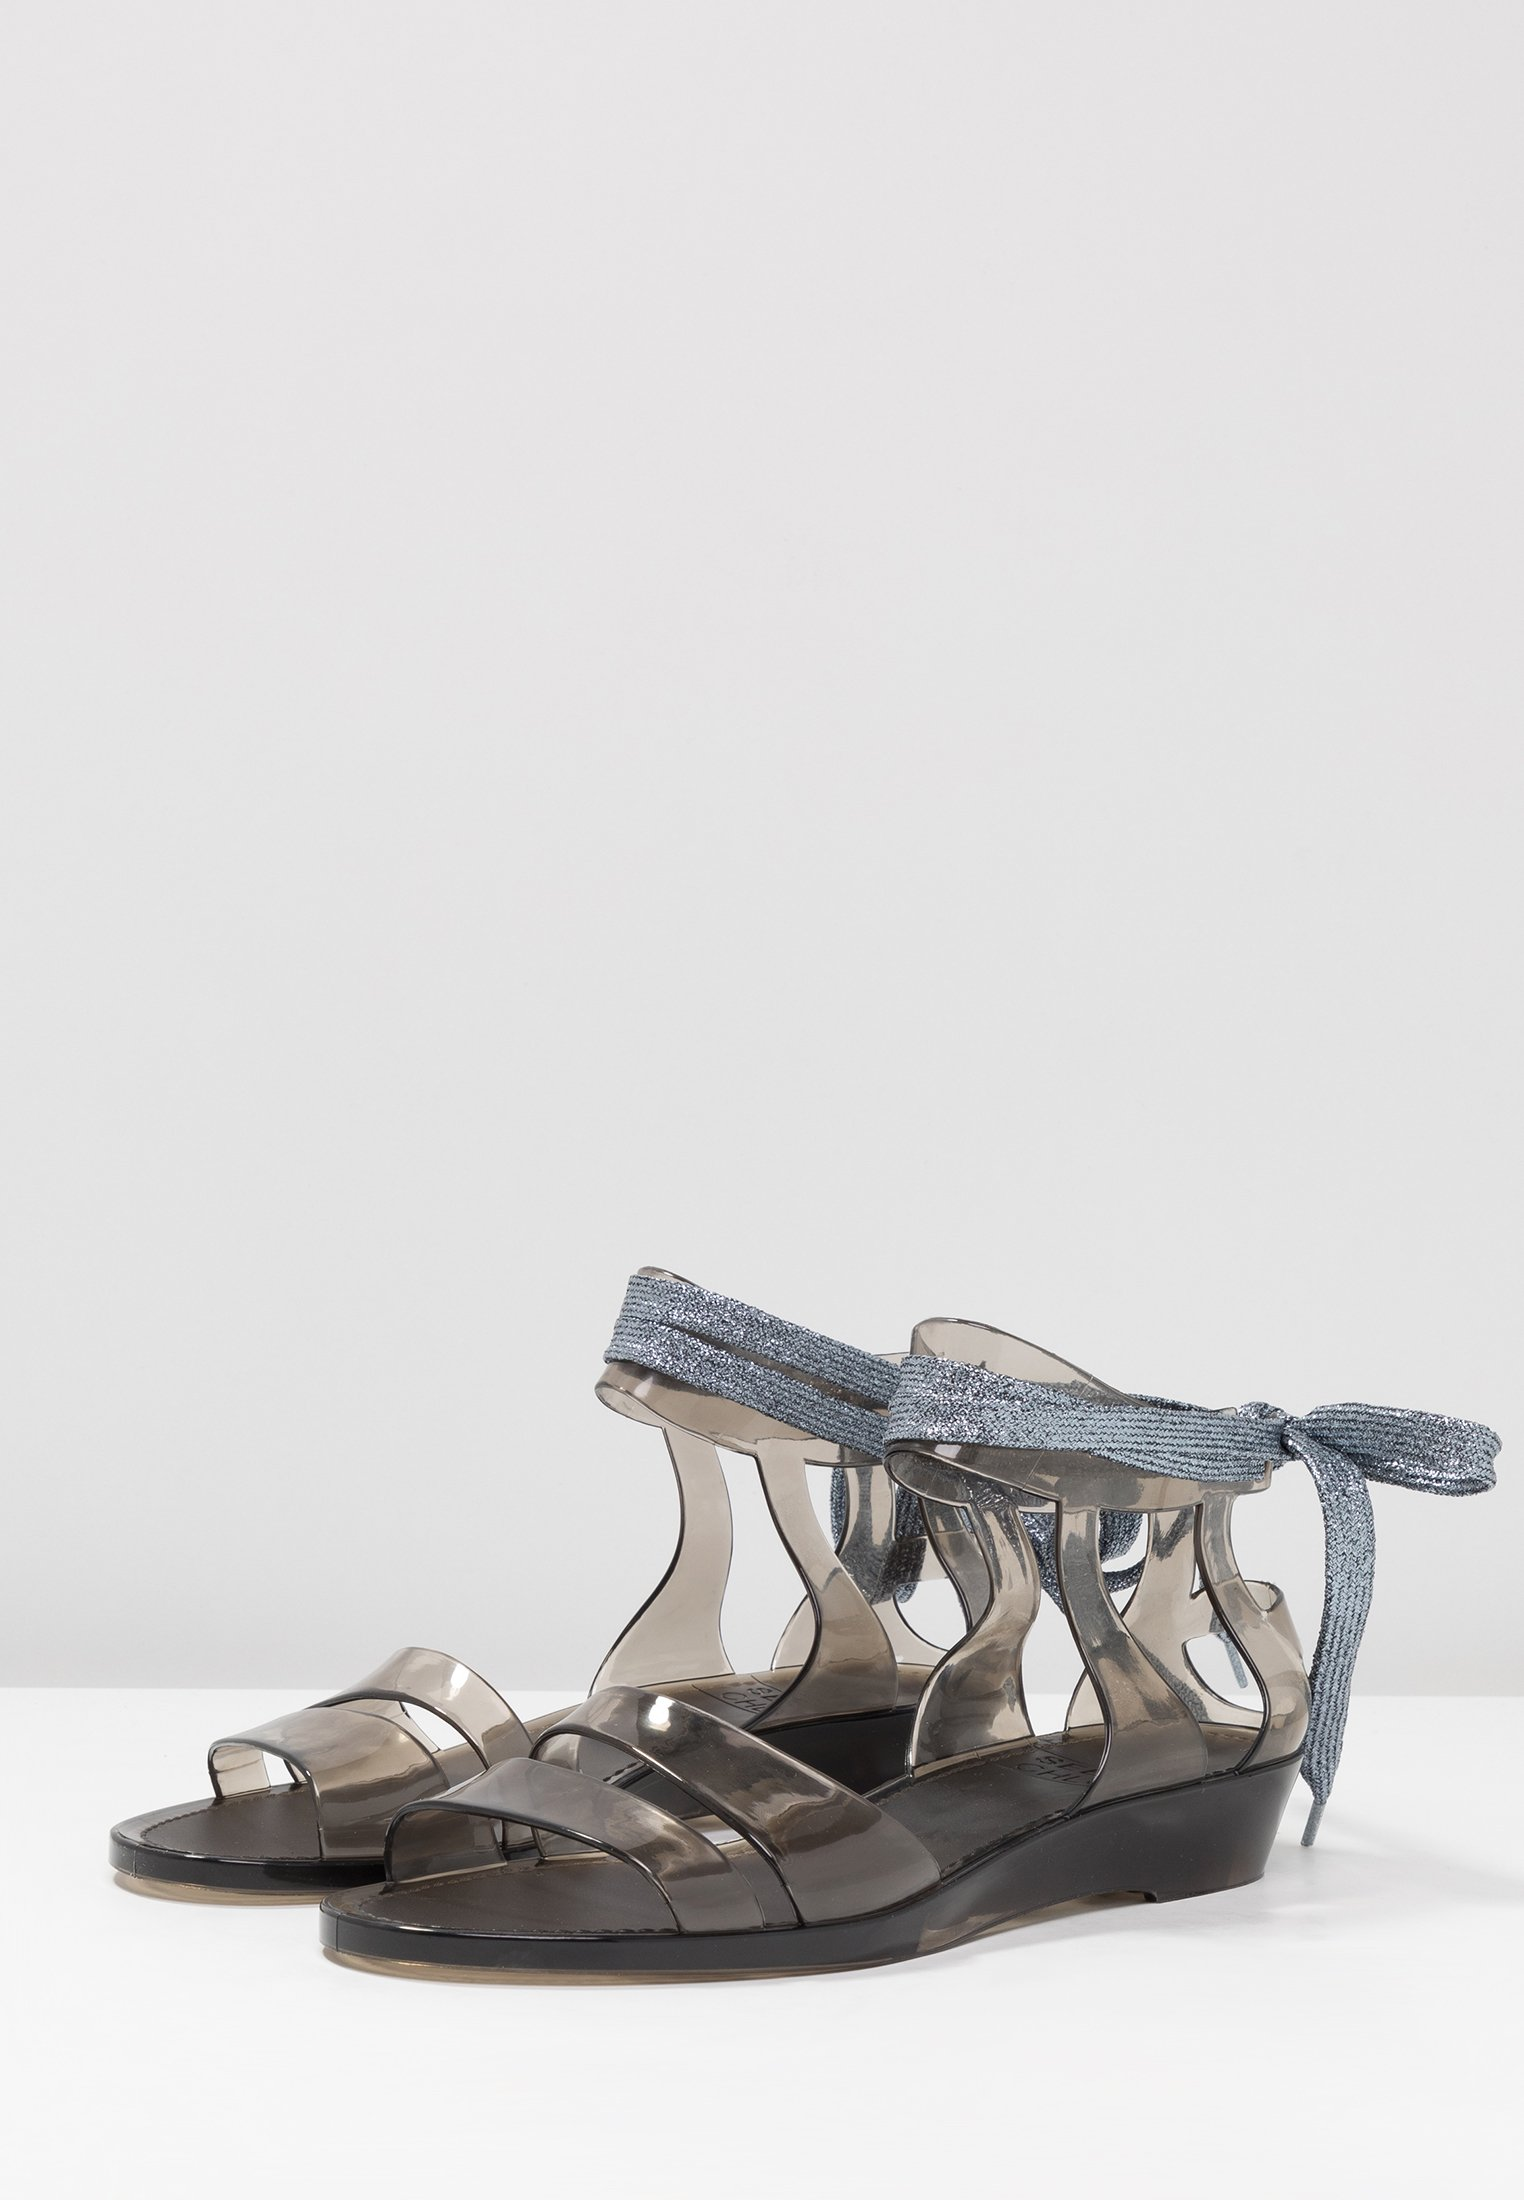 Sandales By BainNero De Transparente See Chloé wyvNm8nOP0